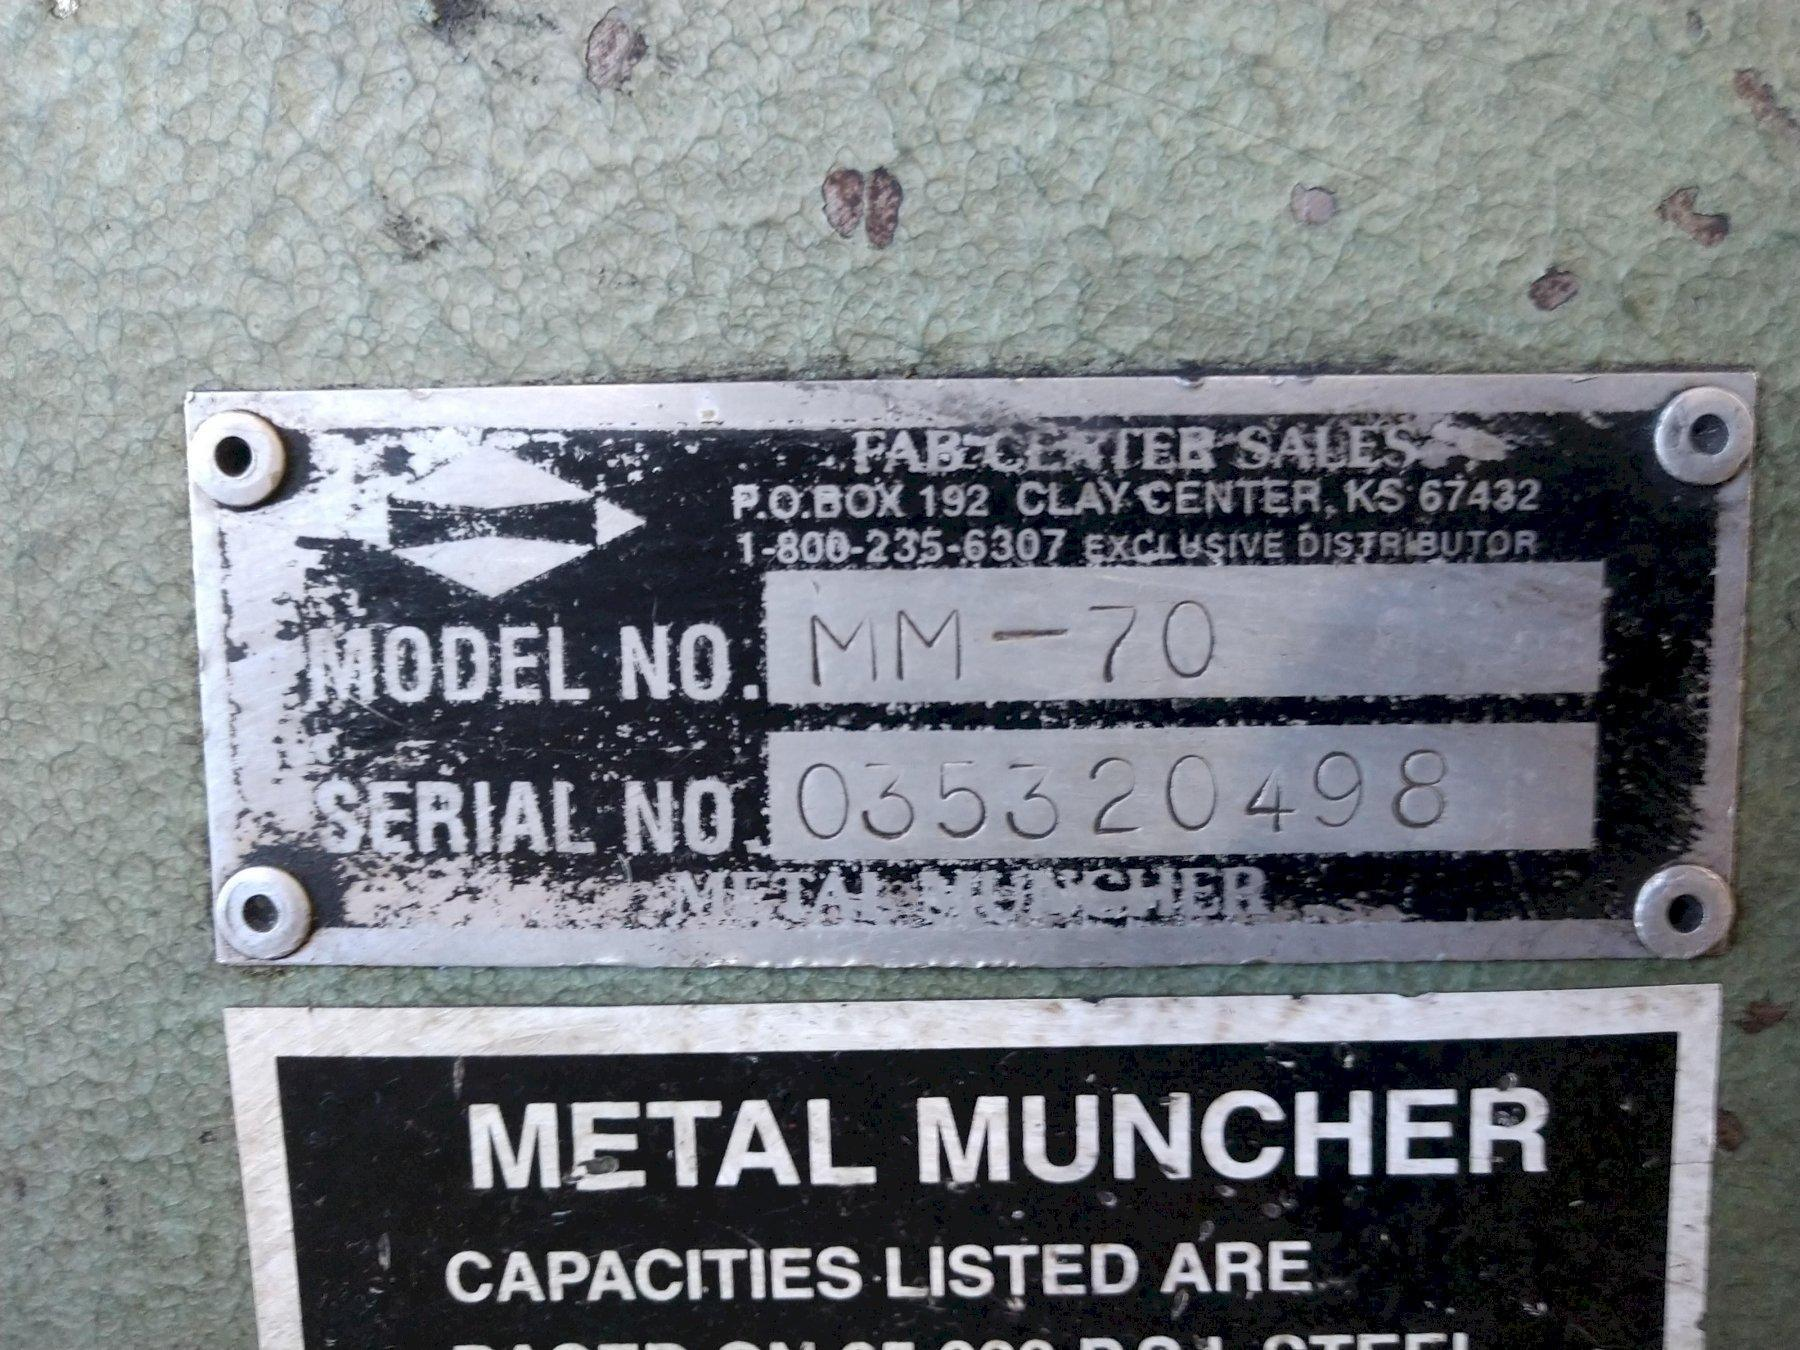 70 TON METAL MUNCHER MODEL #MM-70 HYDRAULIC IRONWORKER: STOCK #13432